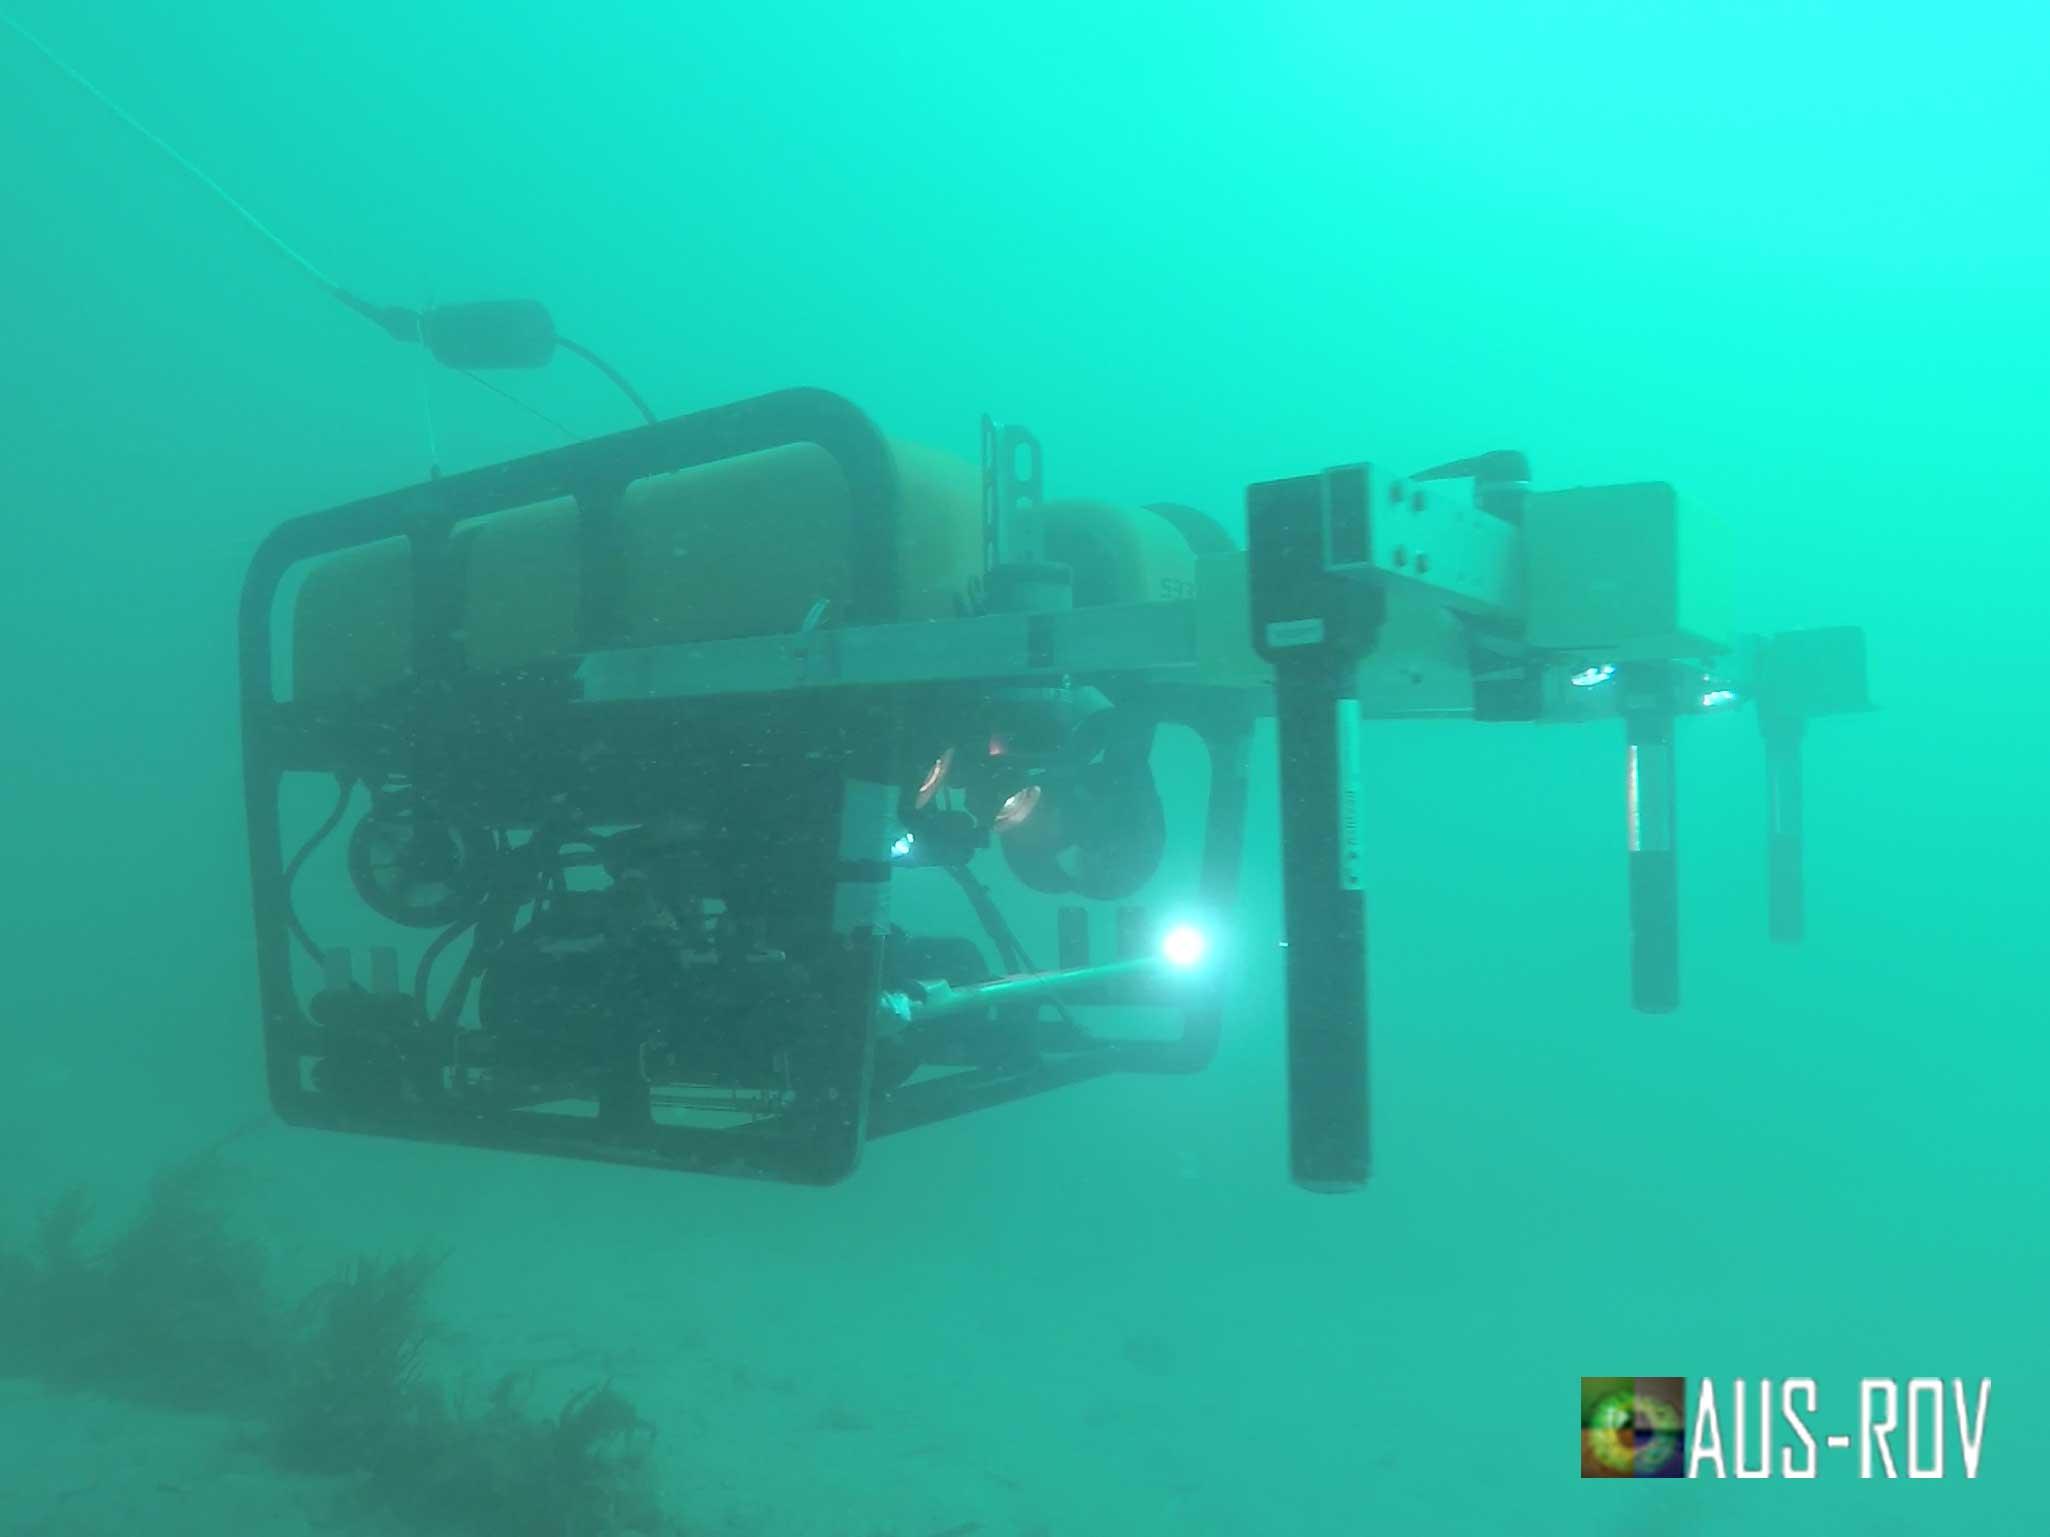 AUS-ROV-Depth-Of-Burial-Pip.jpg